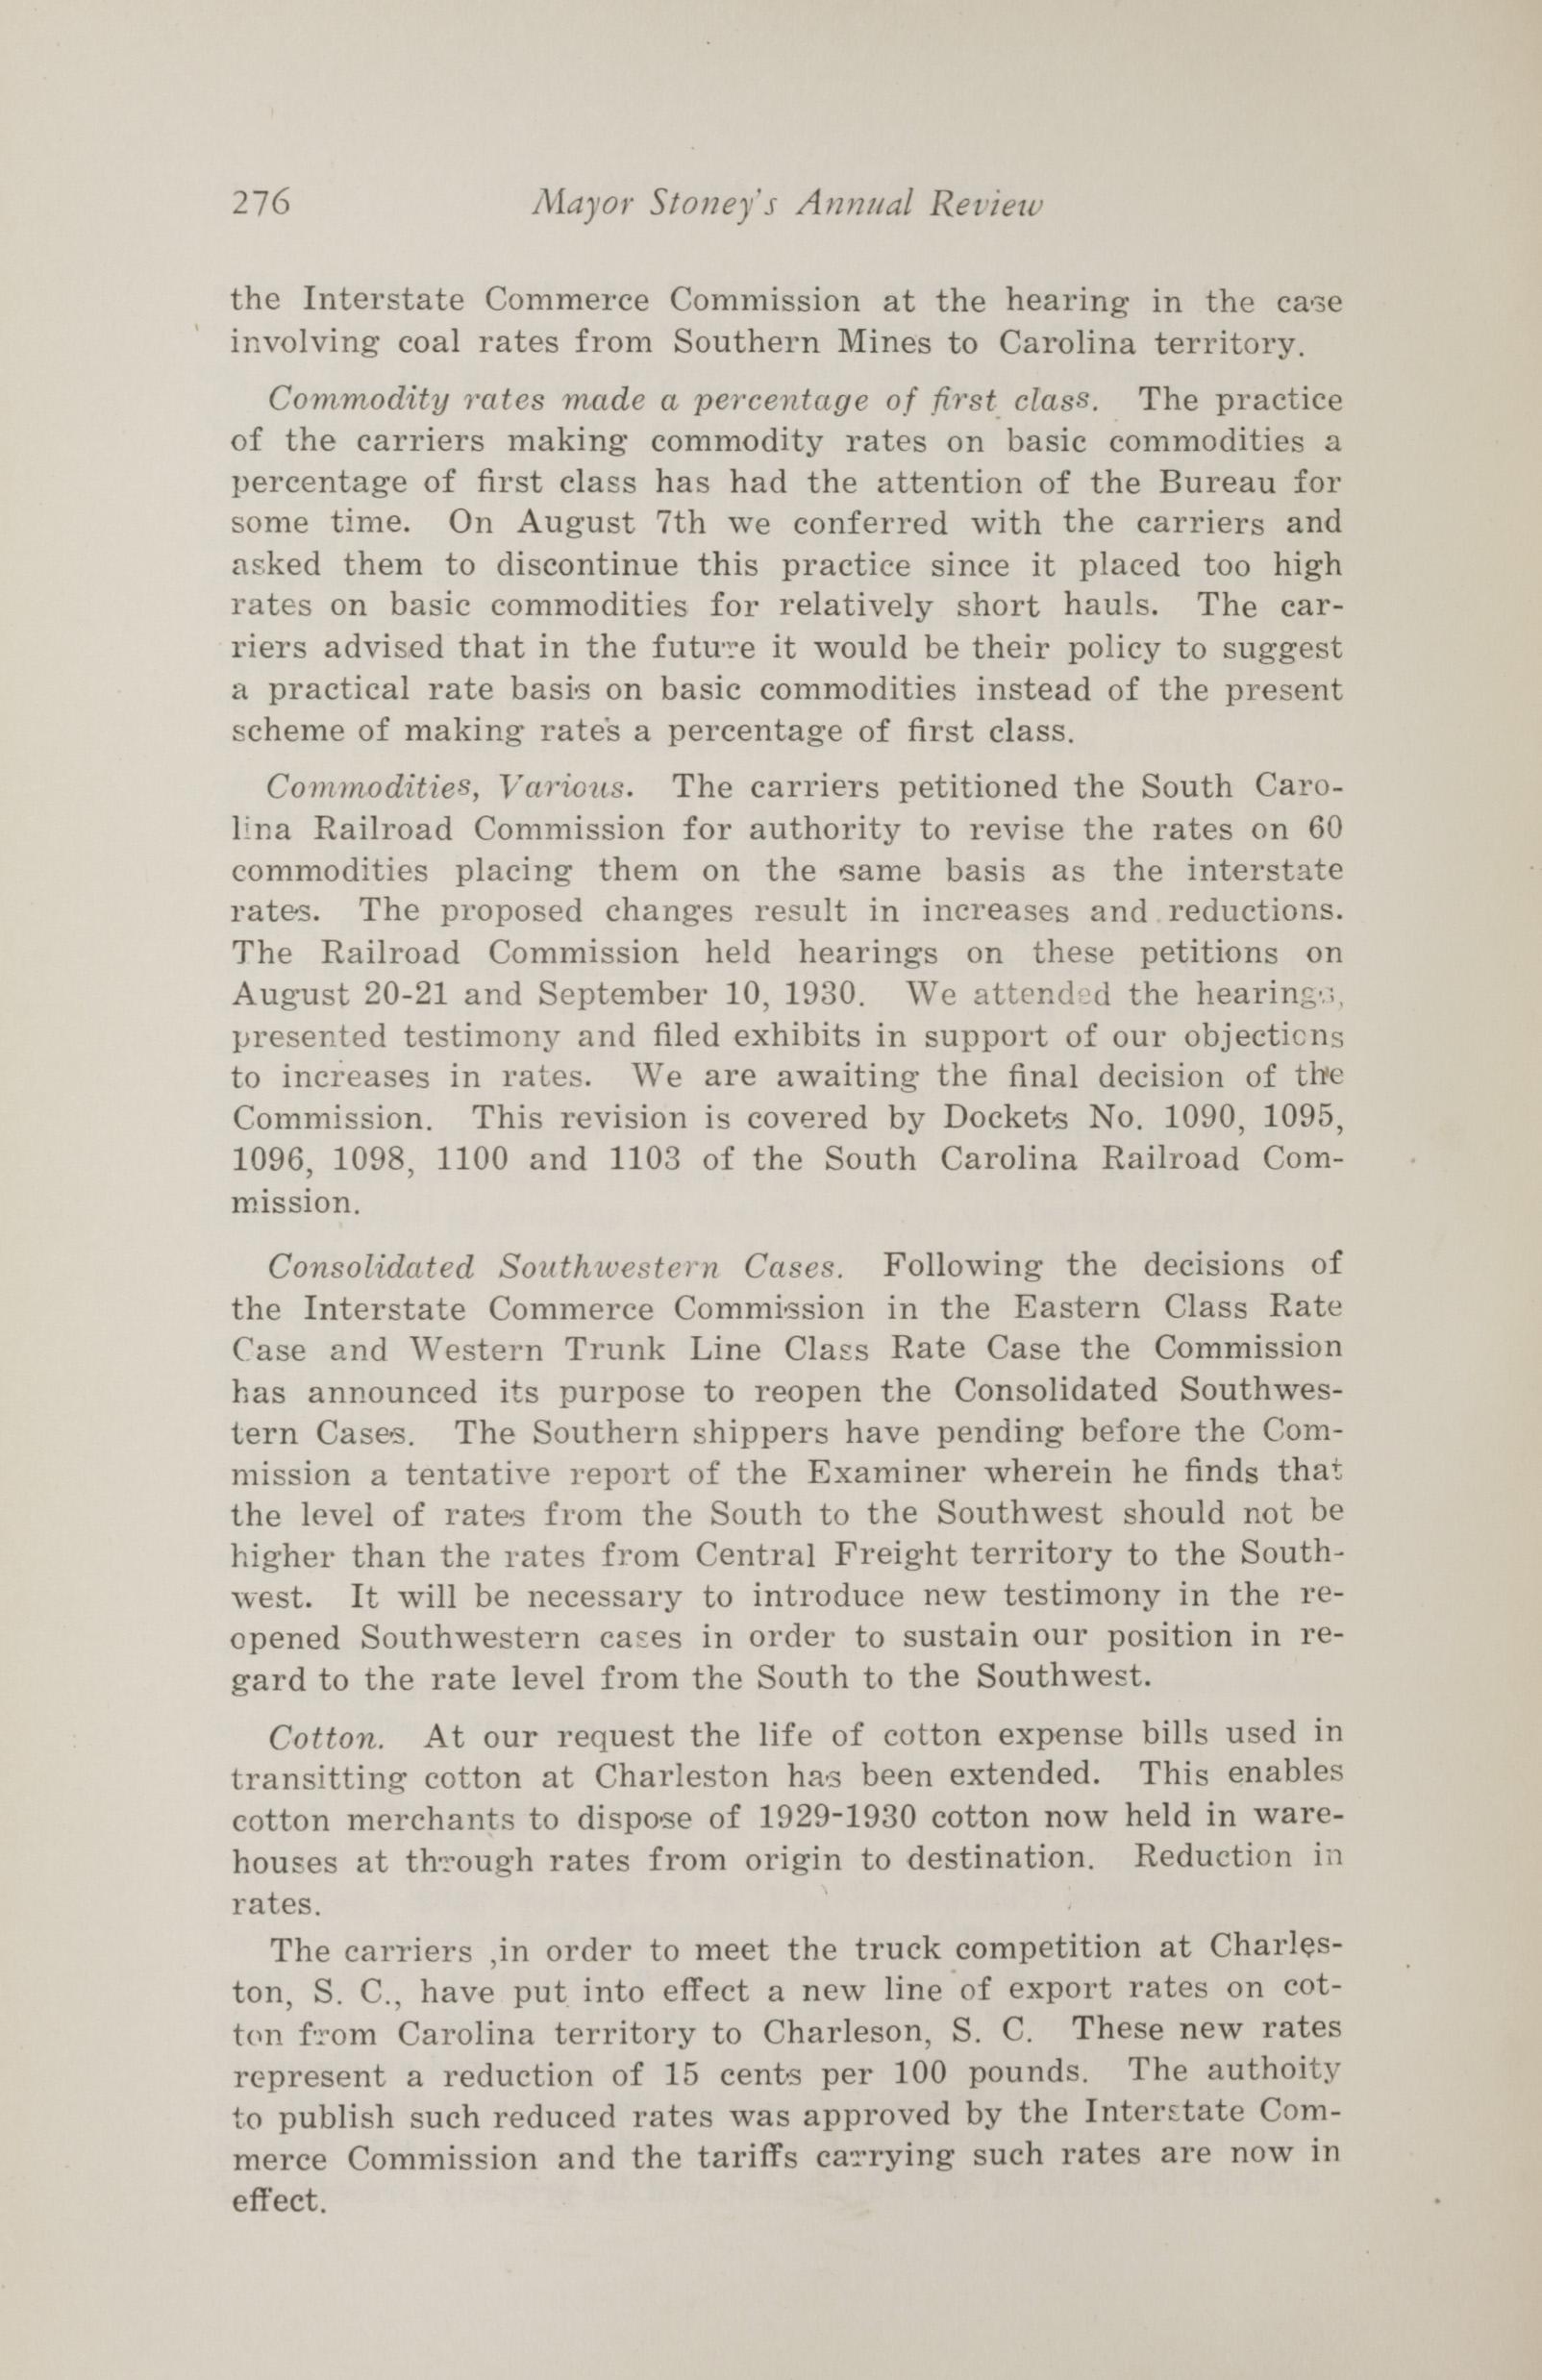 Charleston Yearbook, 1930, page 276